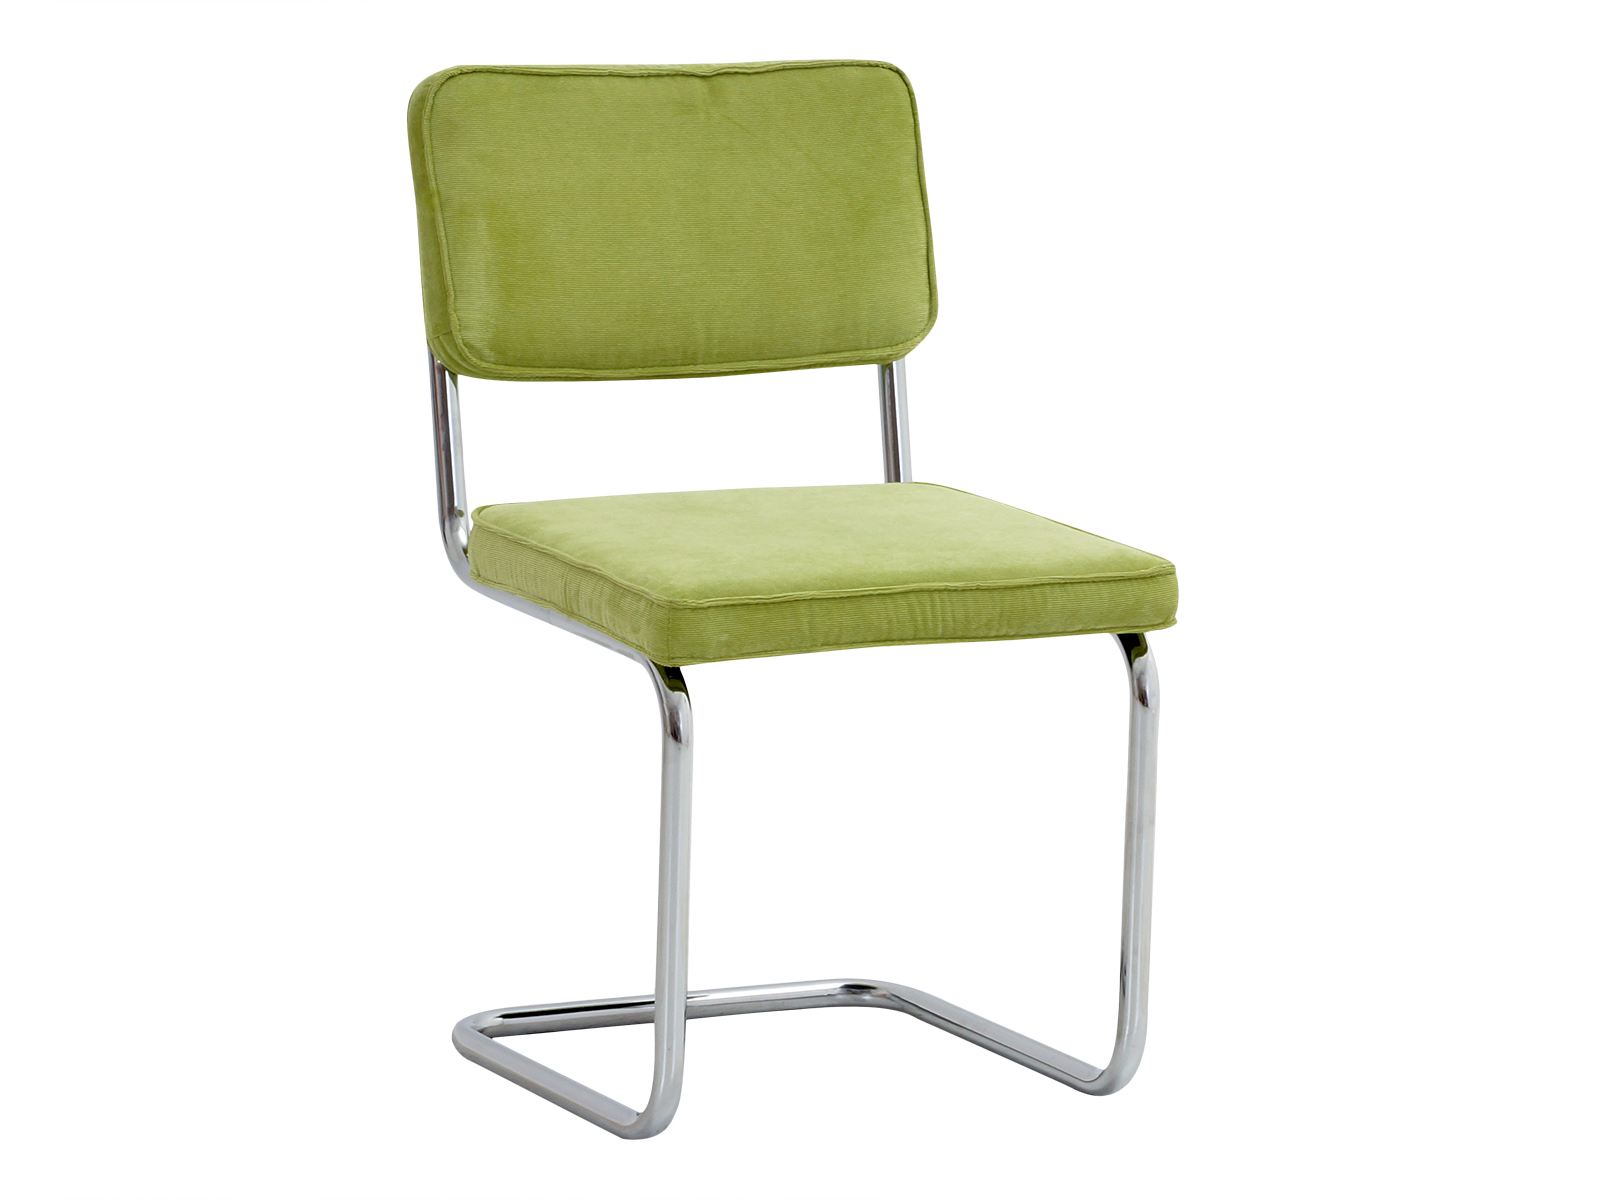 Стул GlenСтулья<br>Стул на металлокаркасе, спинка и сиденье обиты тканью.<br>